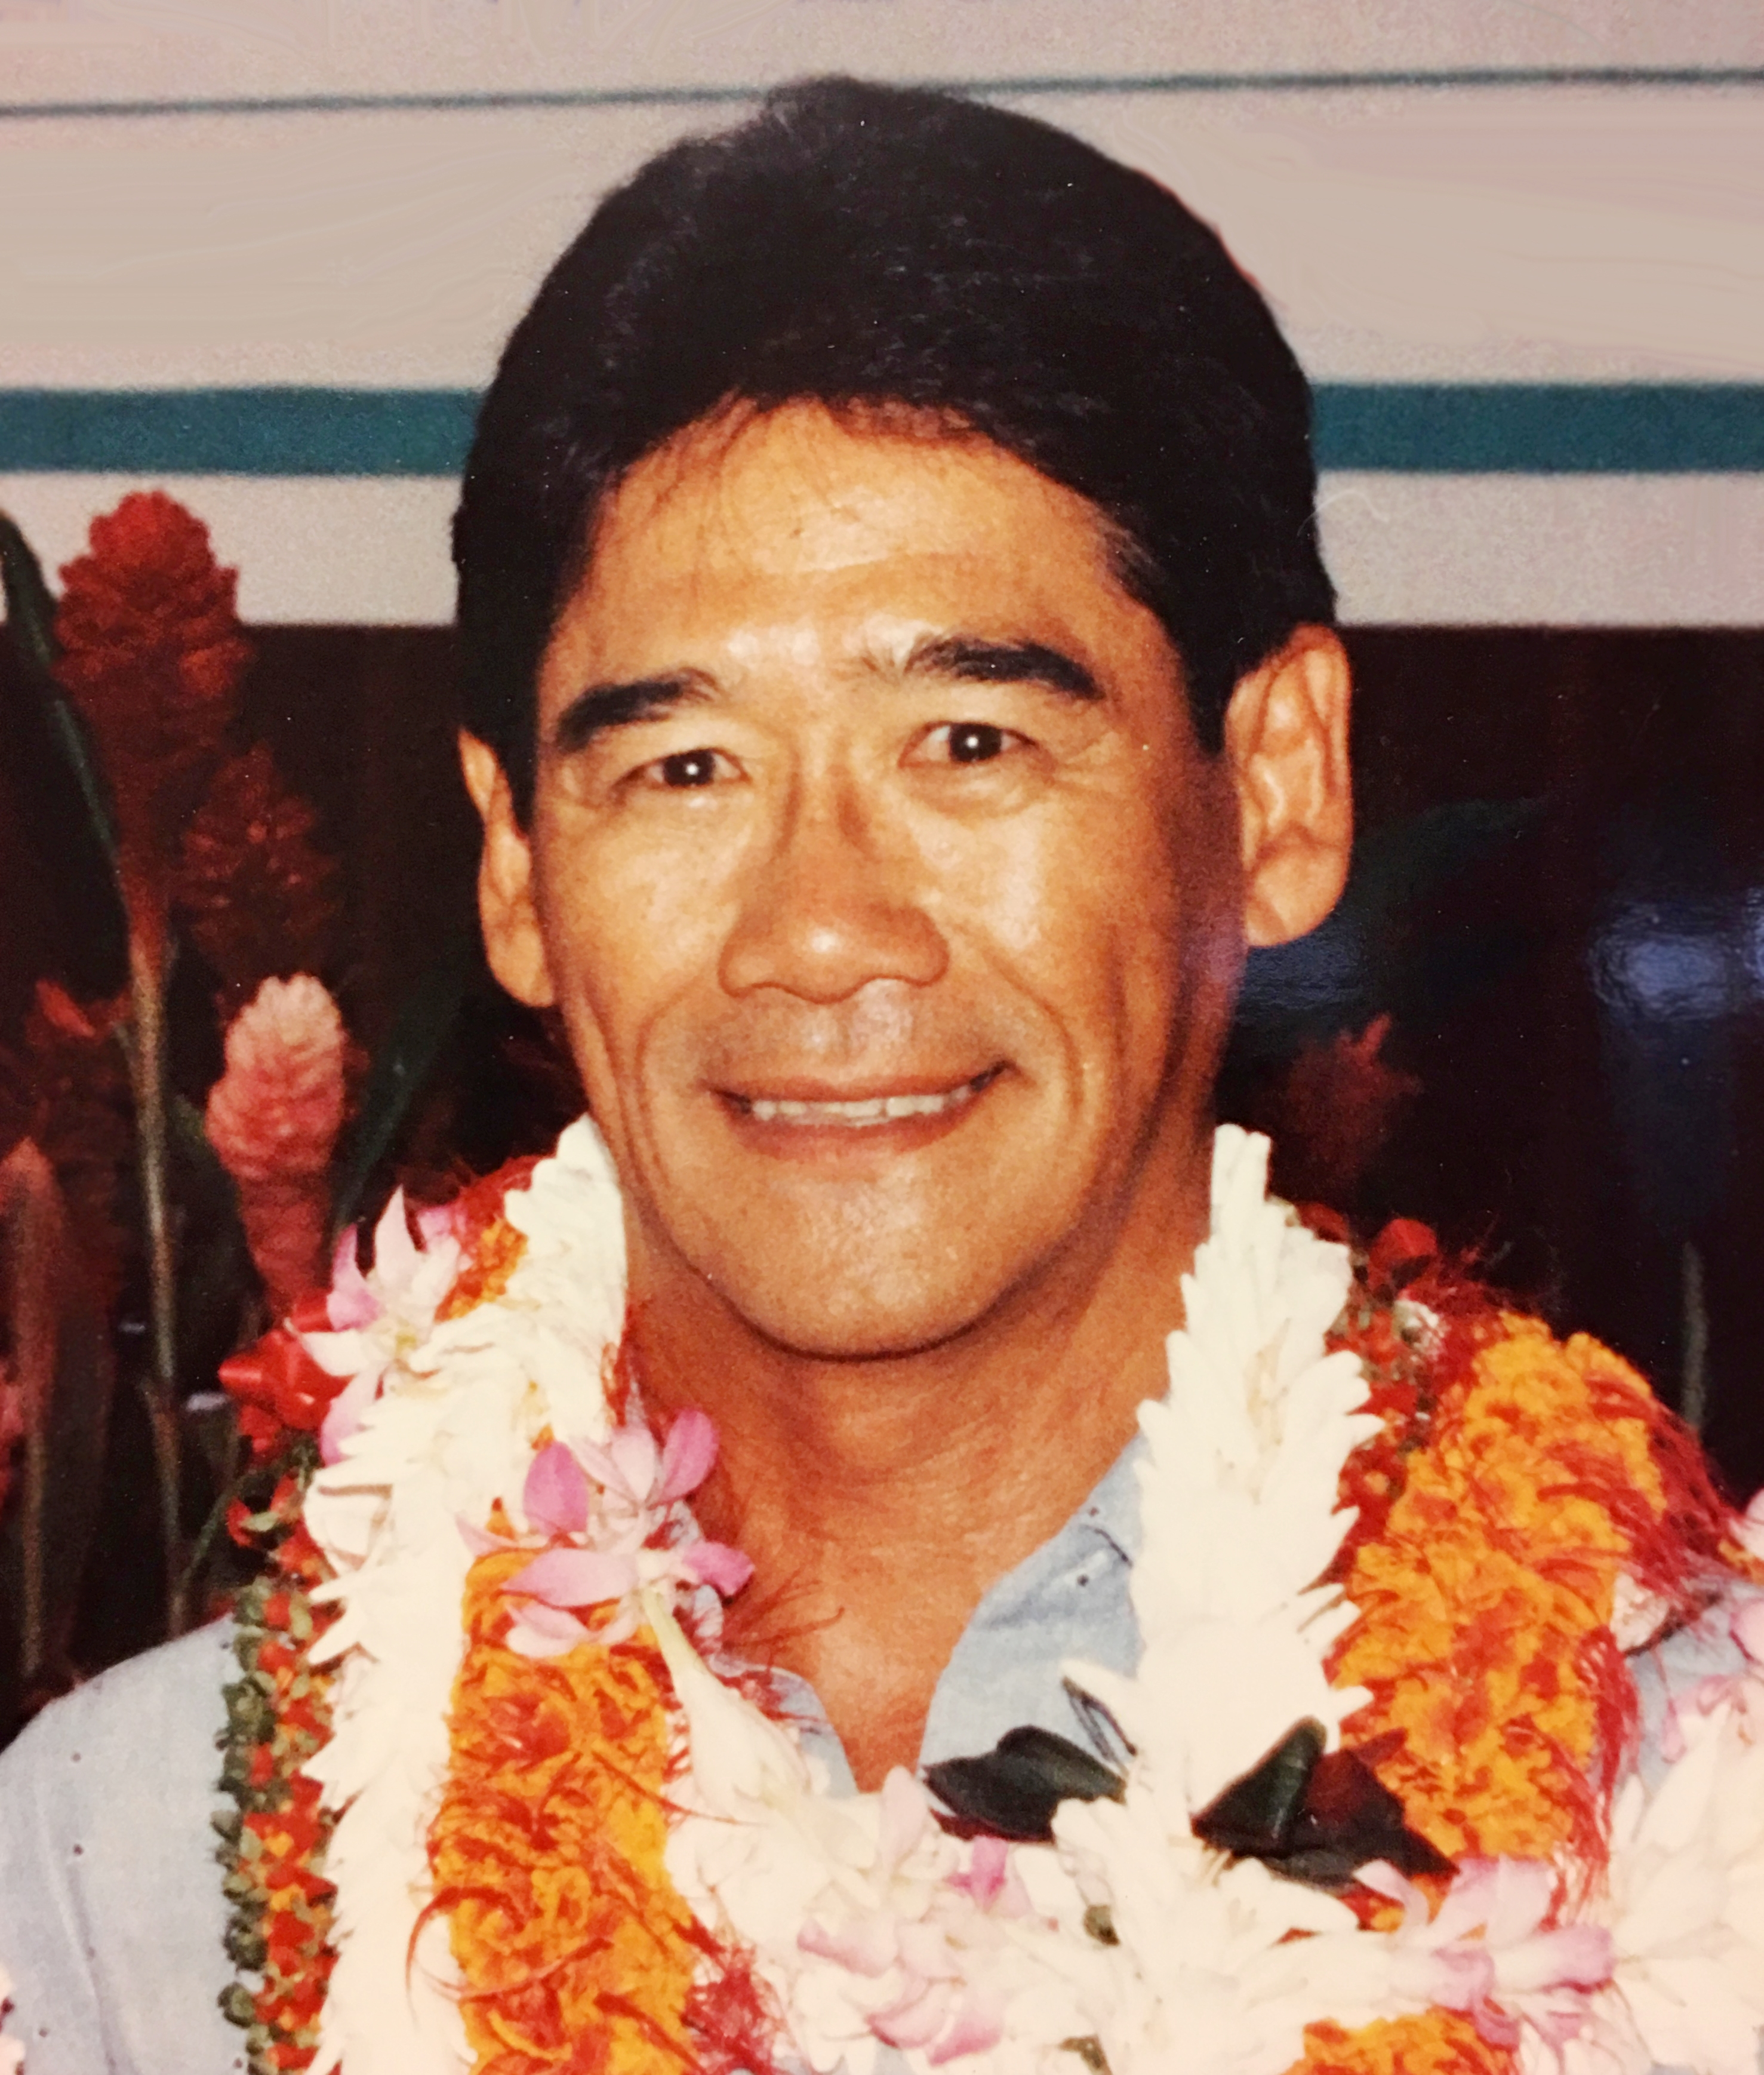 FREDERICK KAORU HIRAYAMA, JR.